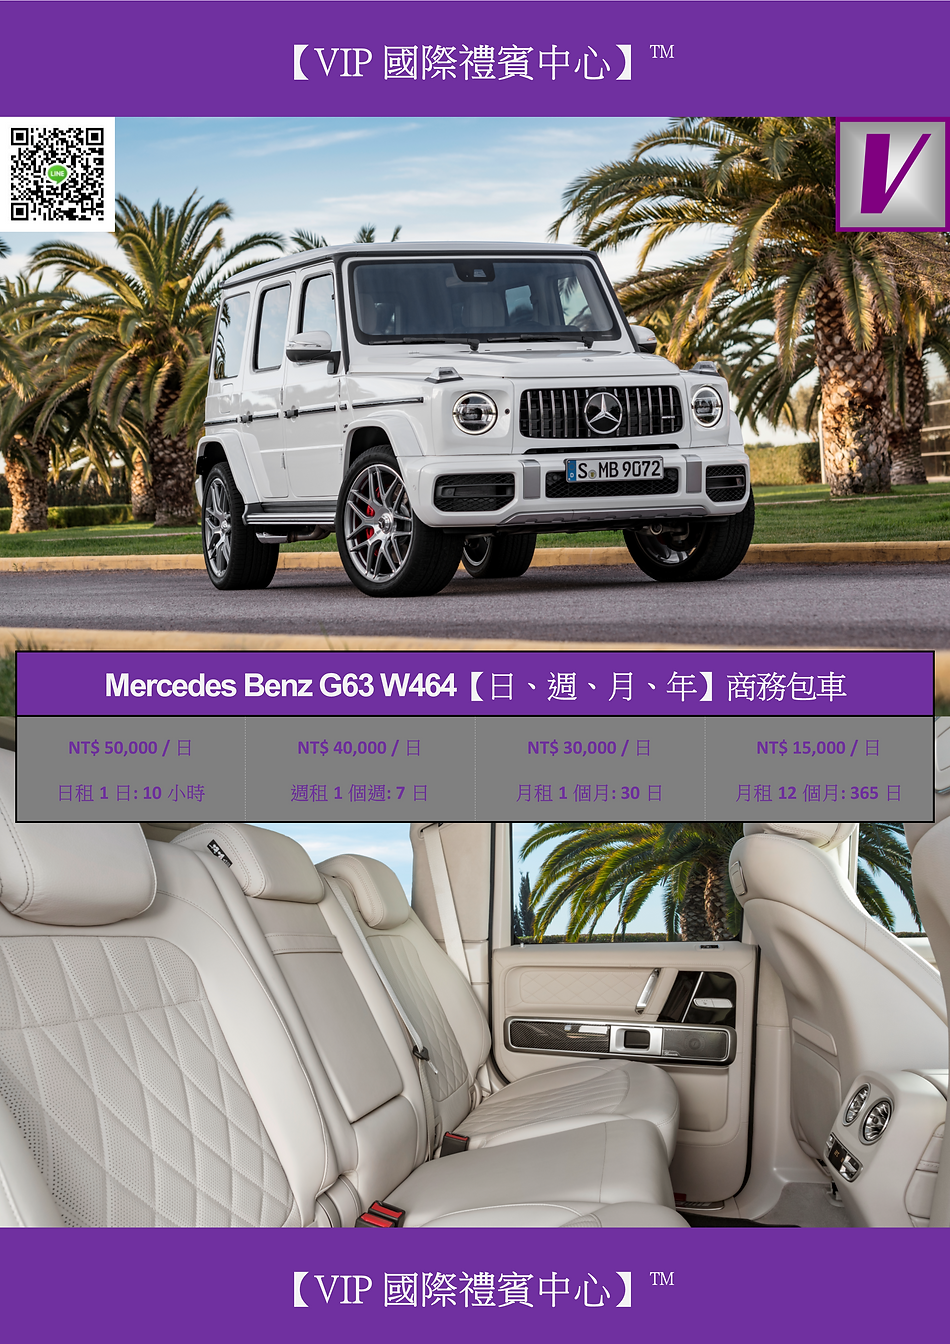 VIP國際禮賓中心 MERCEDES BENZ G63 W464 DM.png